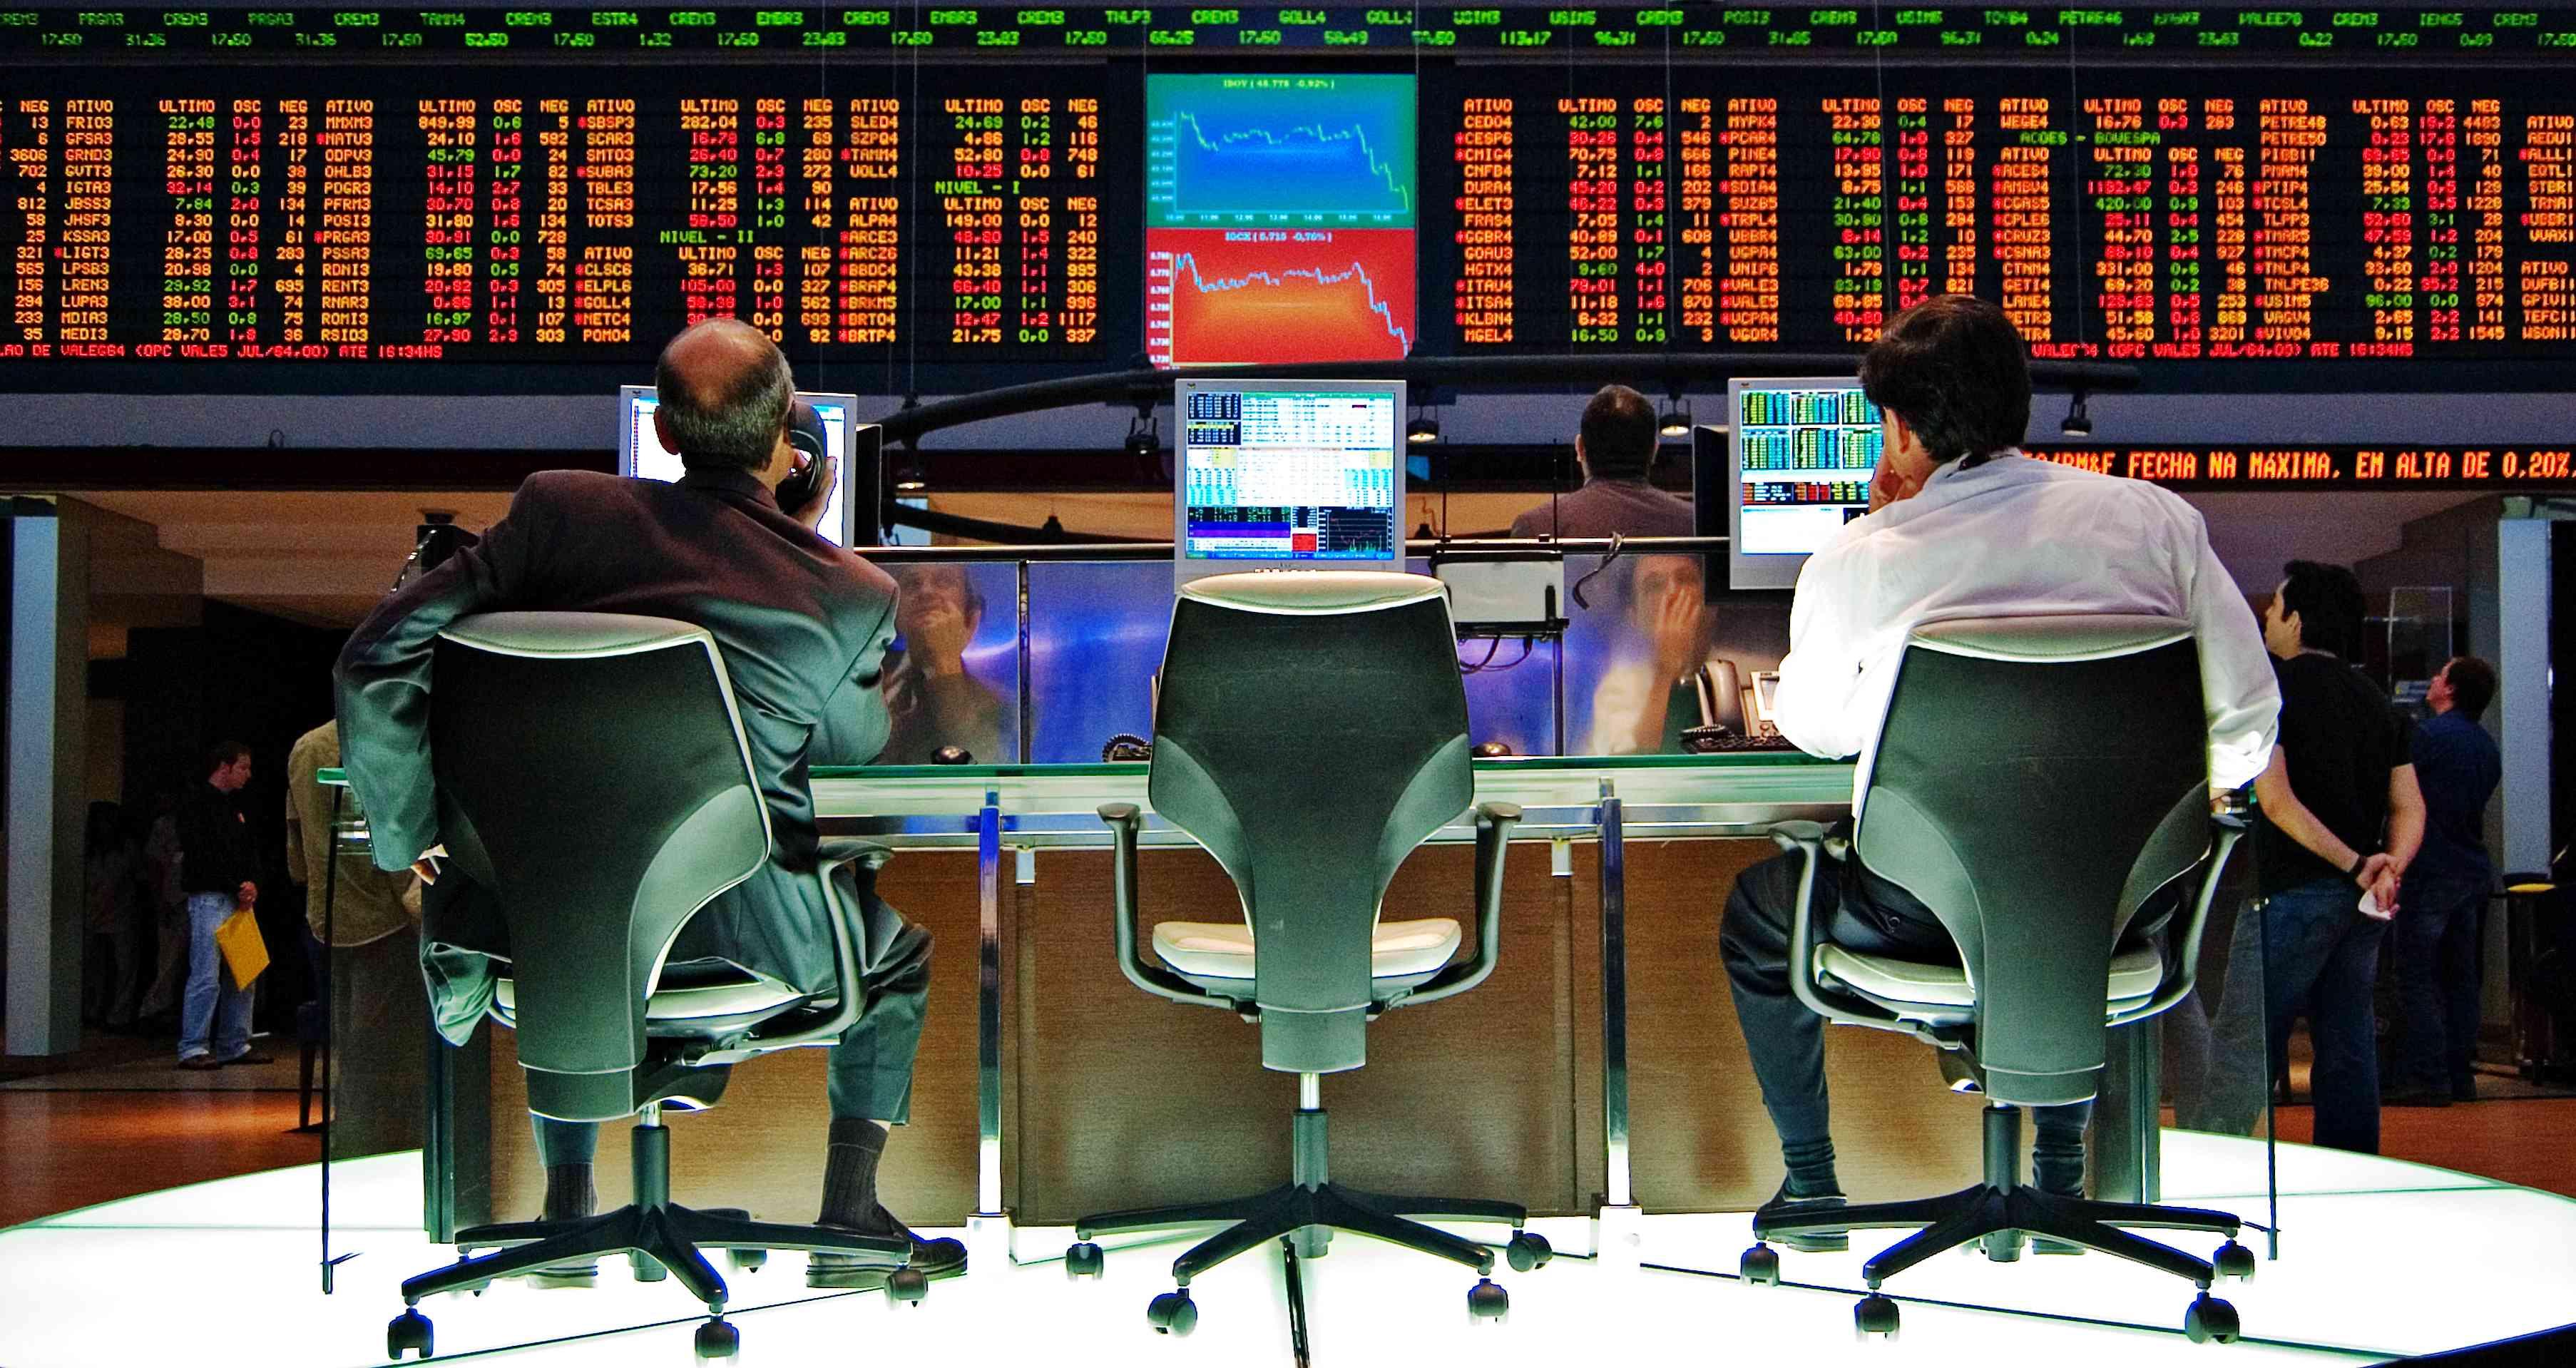 How To Predict Future Stock Price